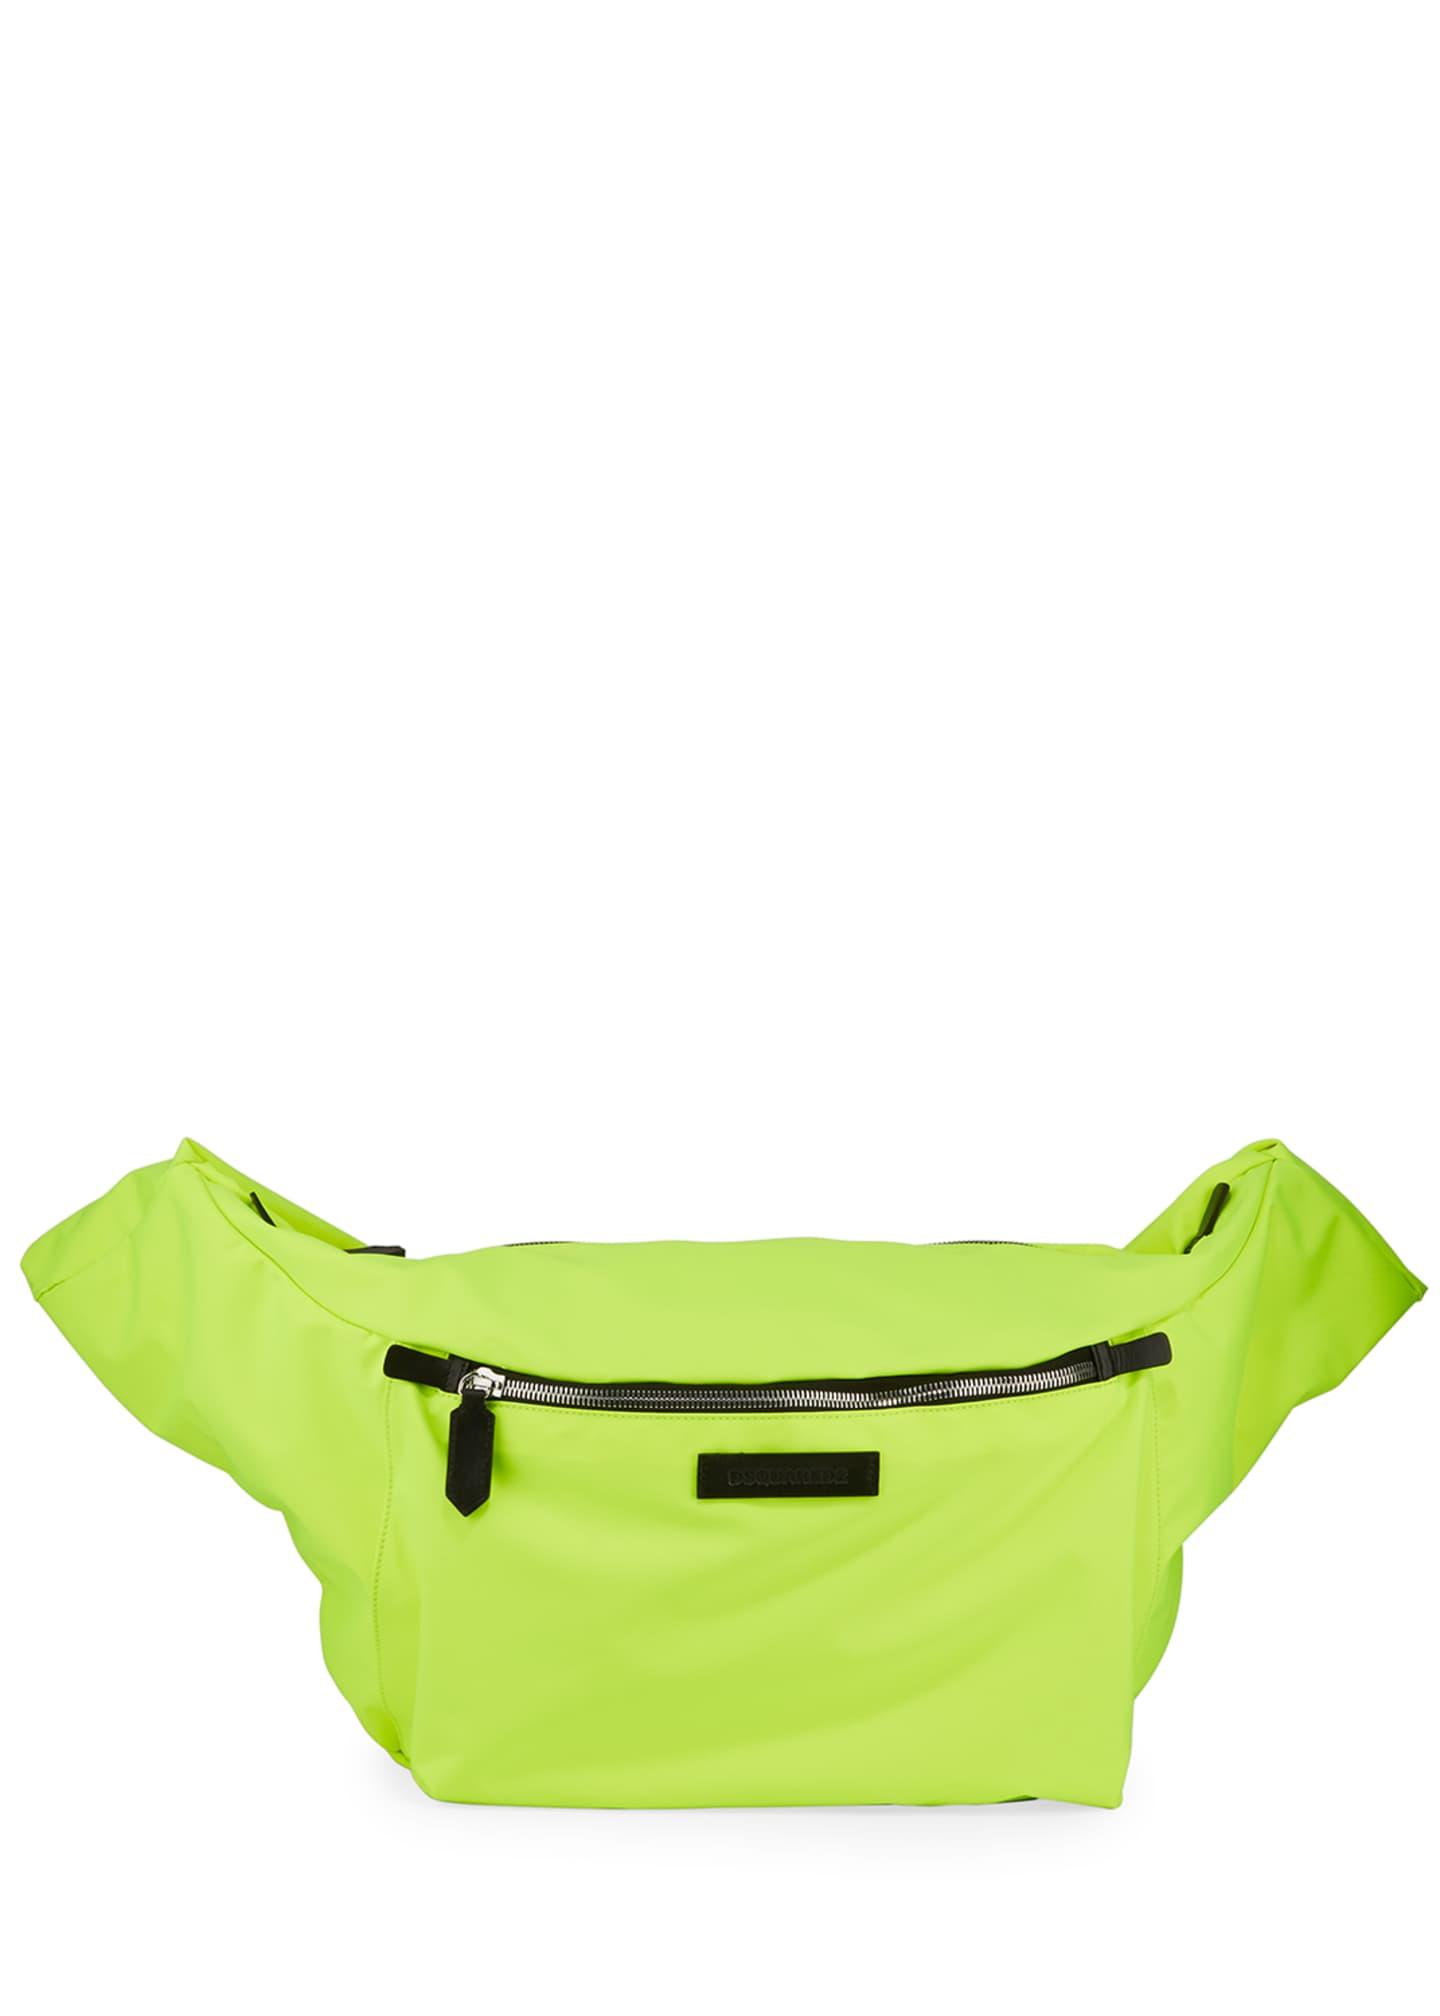 Dsquared2 Men's Nylon Belt Bag with Sleeve Straps